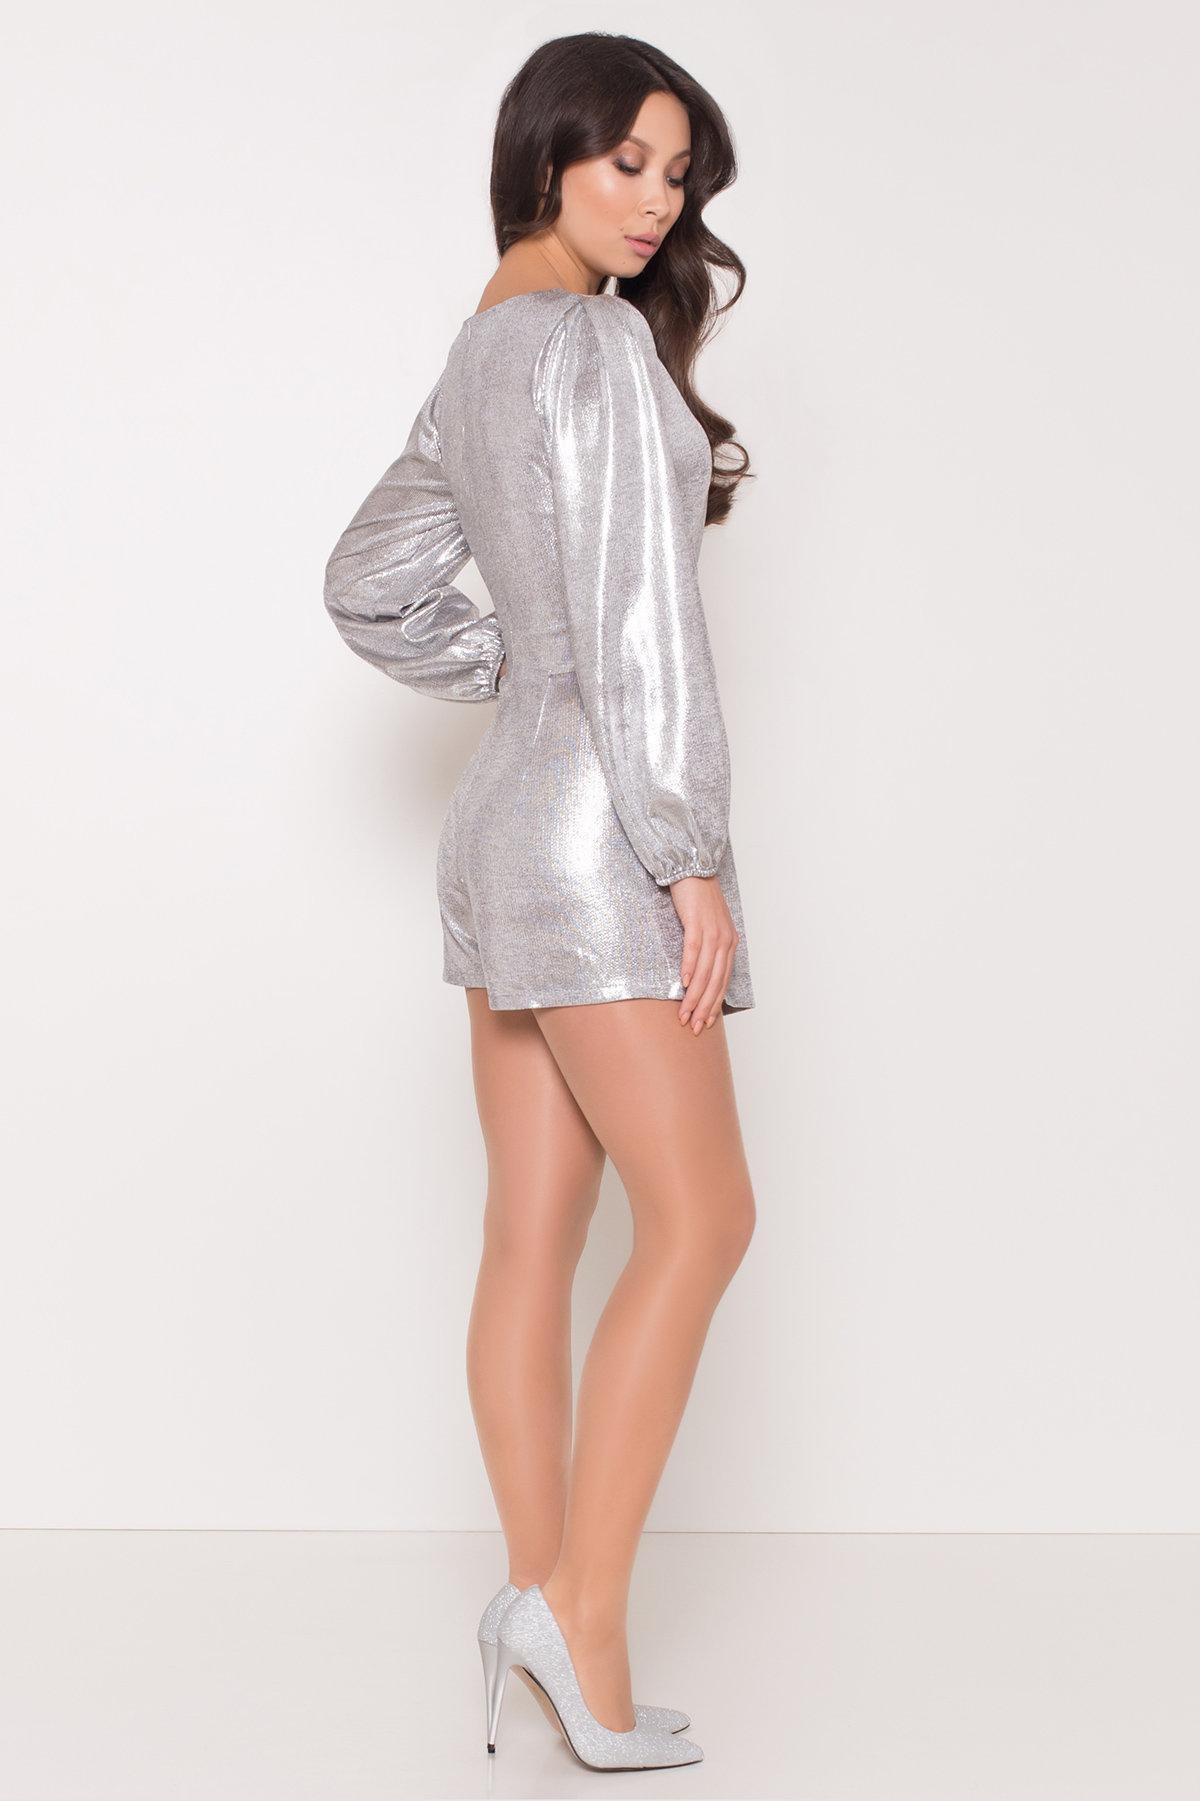 Комбинезон с шортами цвета металлик Шелли 8553 АРТ. 44892 Цвет: Серый/серебро - фото 3, интернет магазин tm-modus.ru